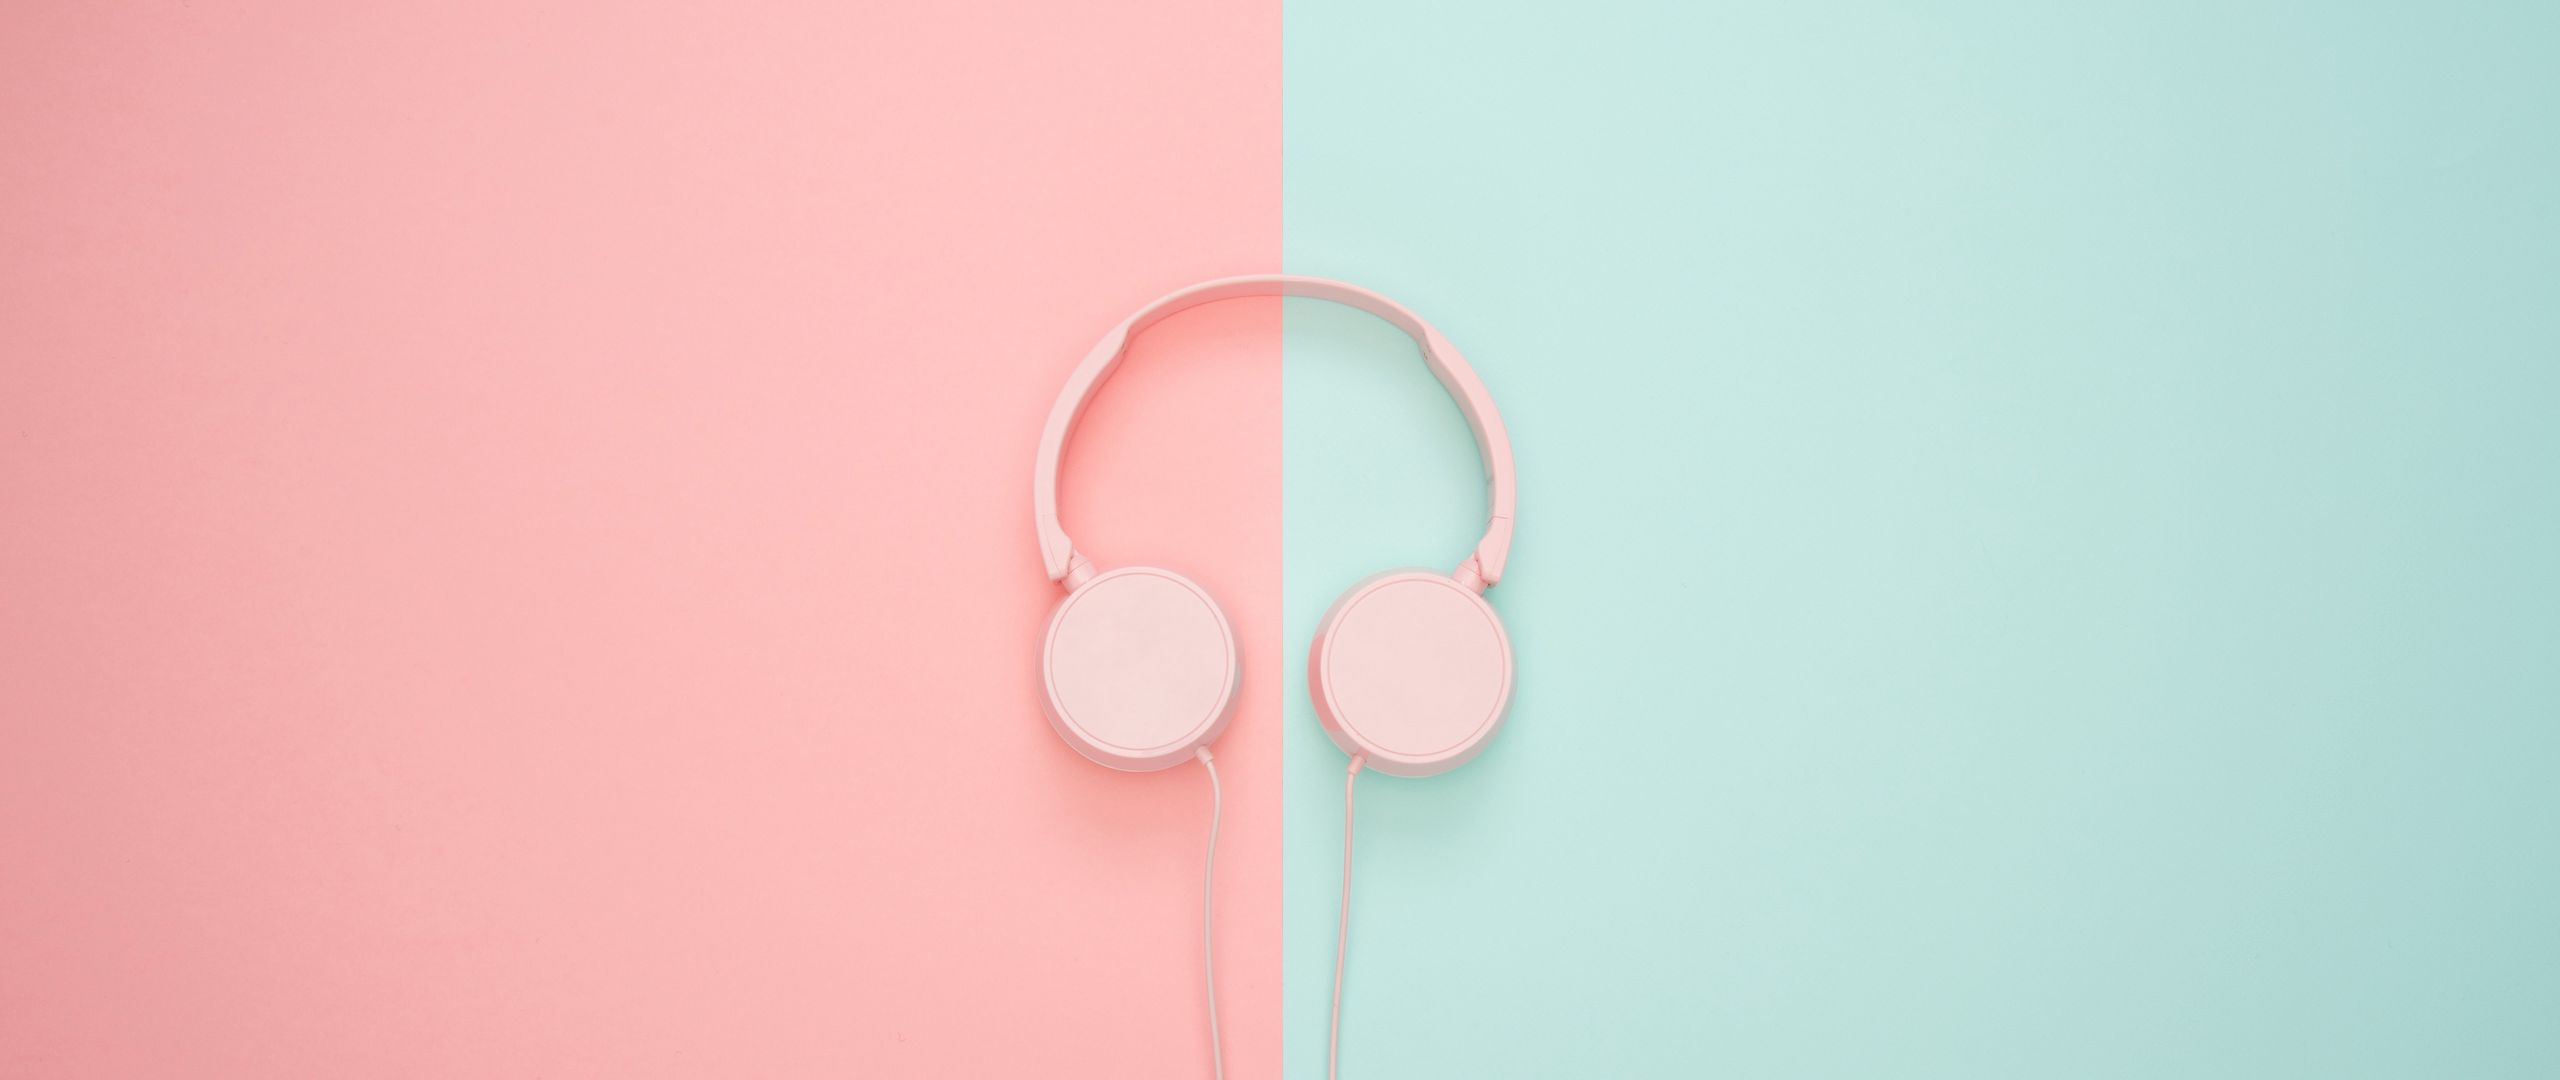 2560x1080 Wallpaper headphones, minimalism, pink, pastel